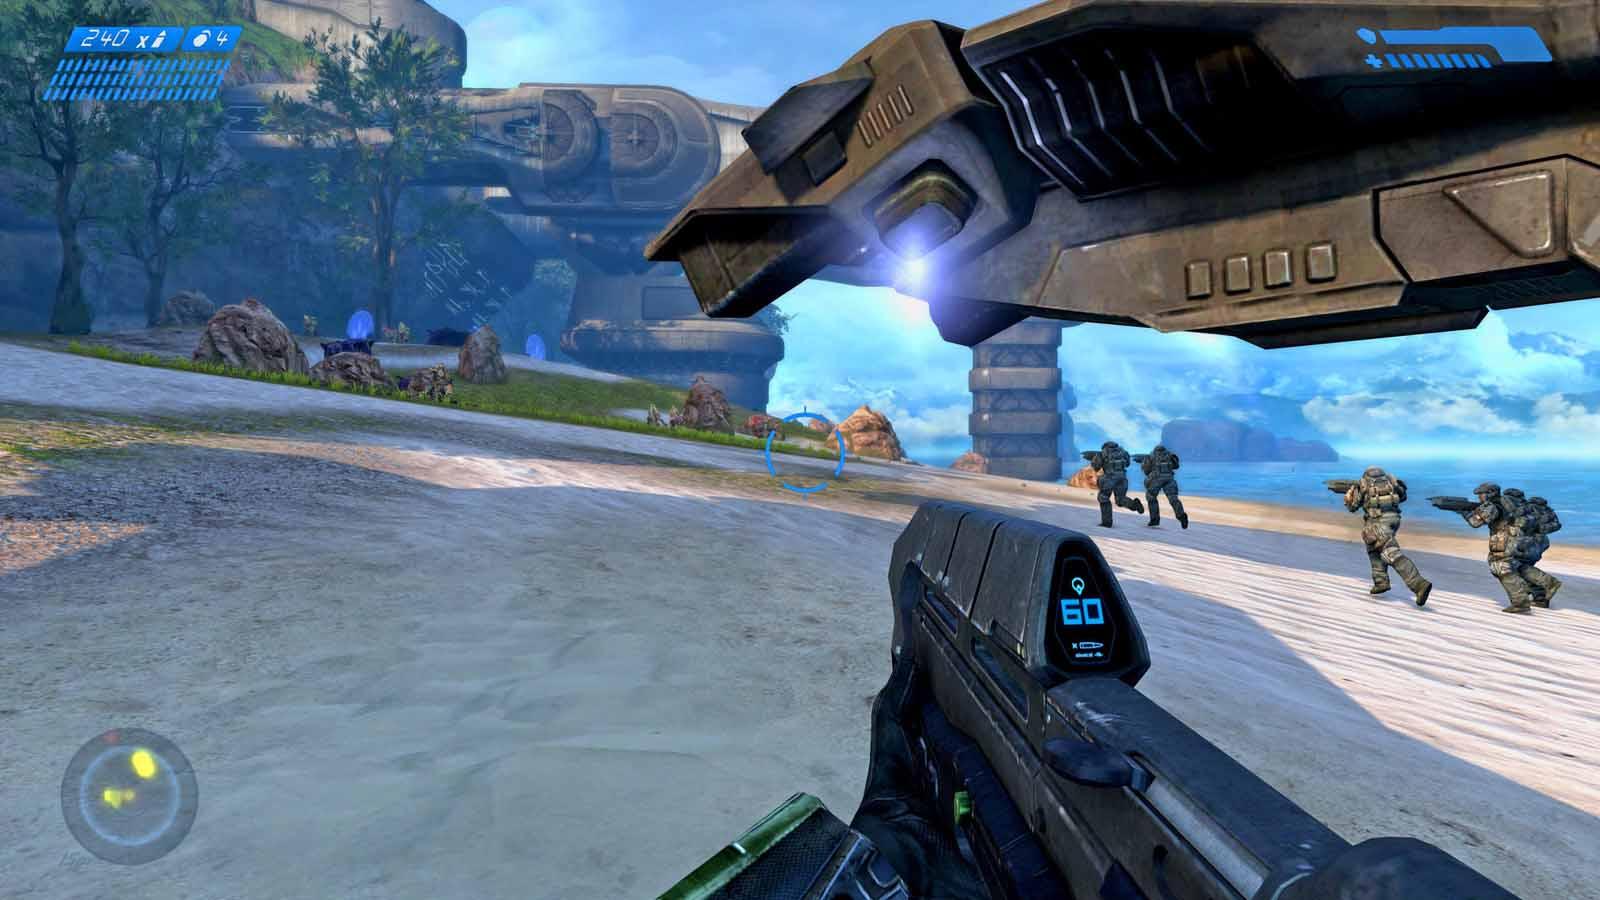 halo combat evolved on steam